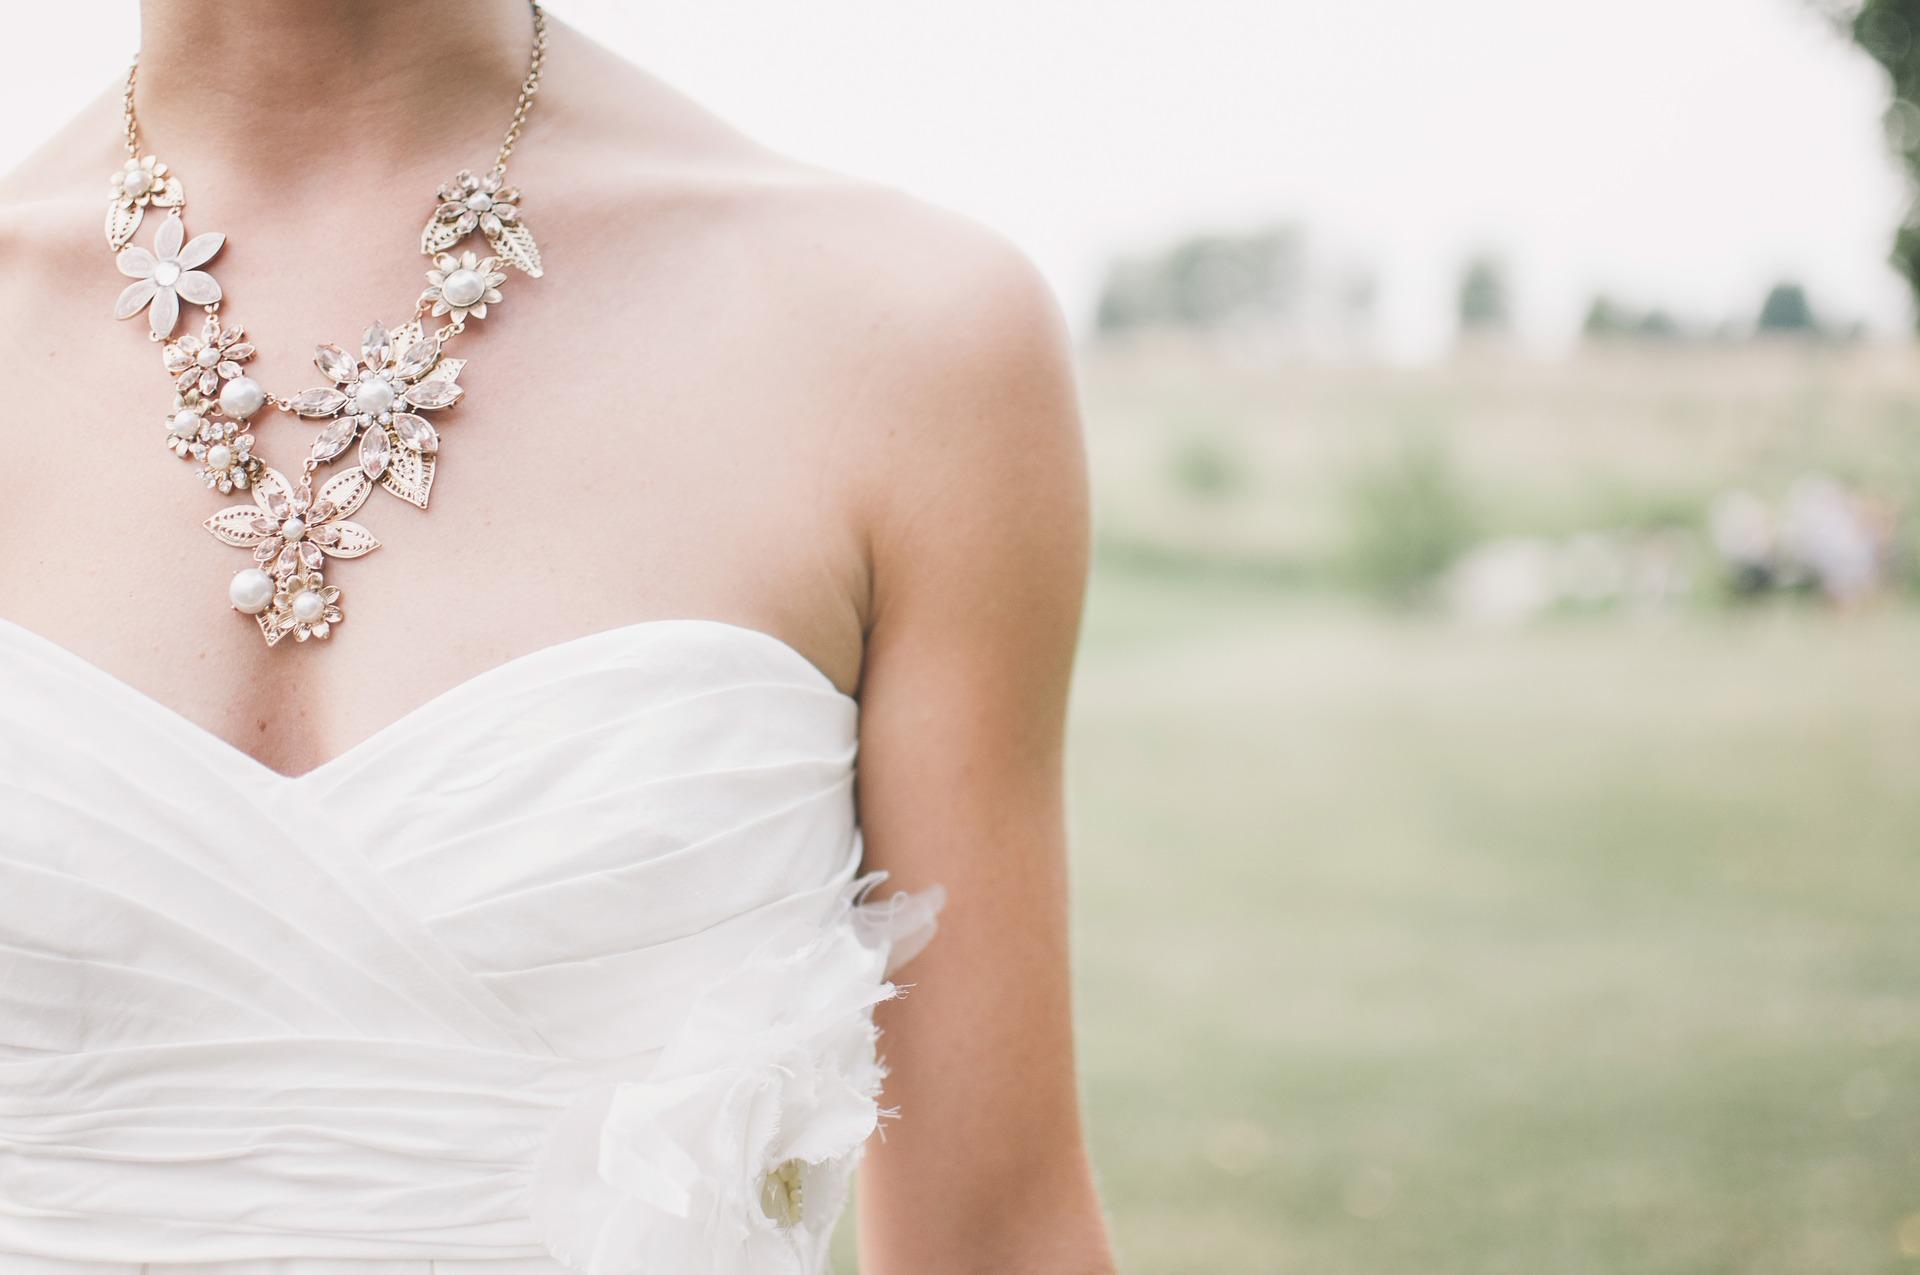 bride-wedding-dress-tips.jpg